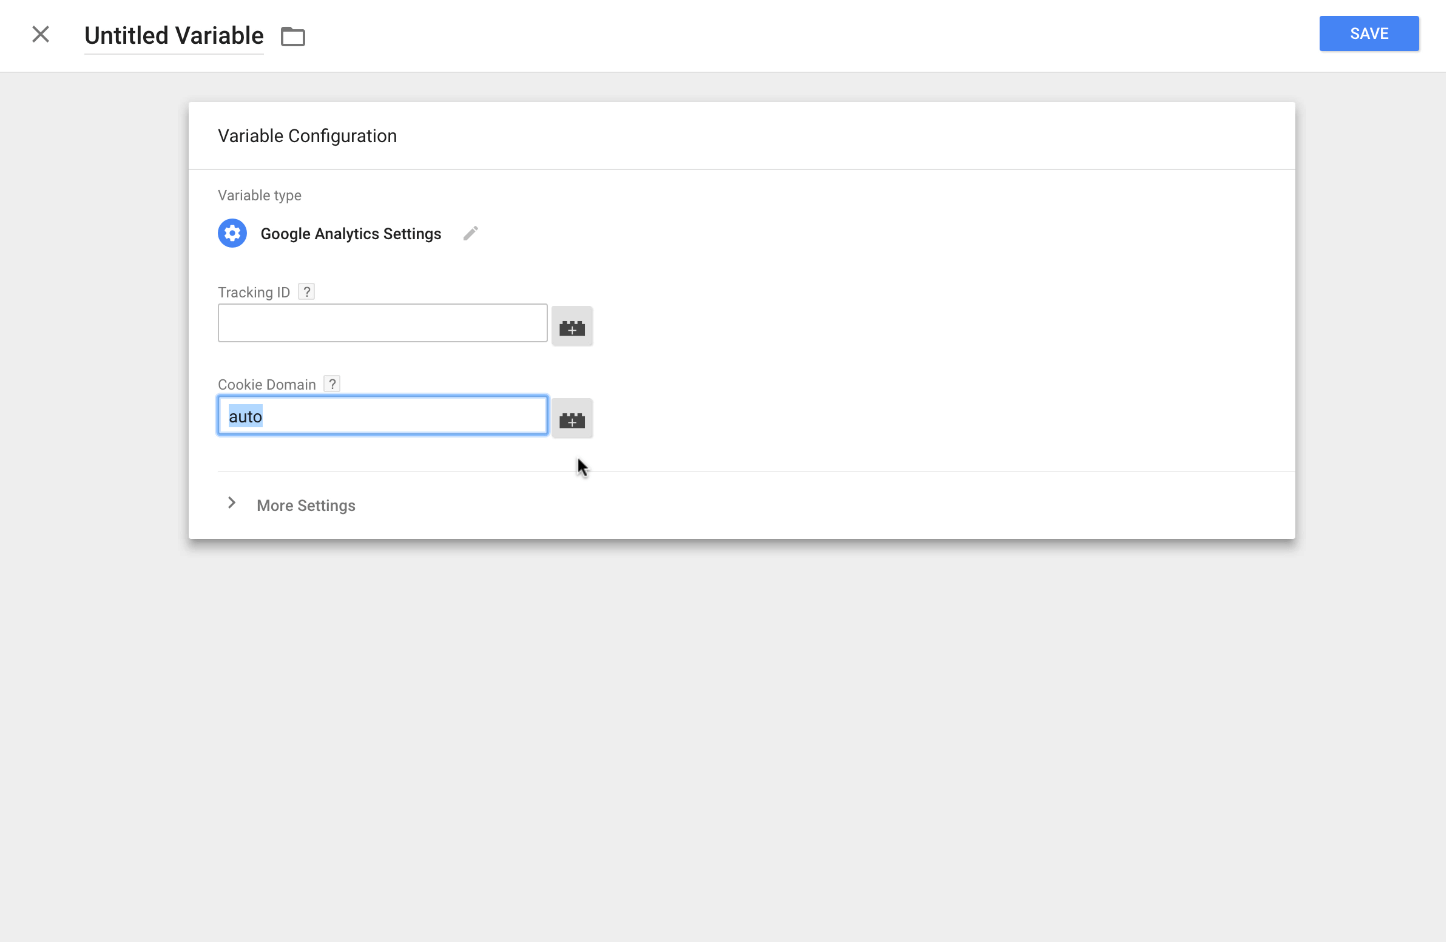 Google Analytics cookie domain